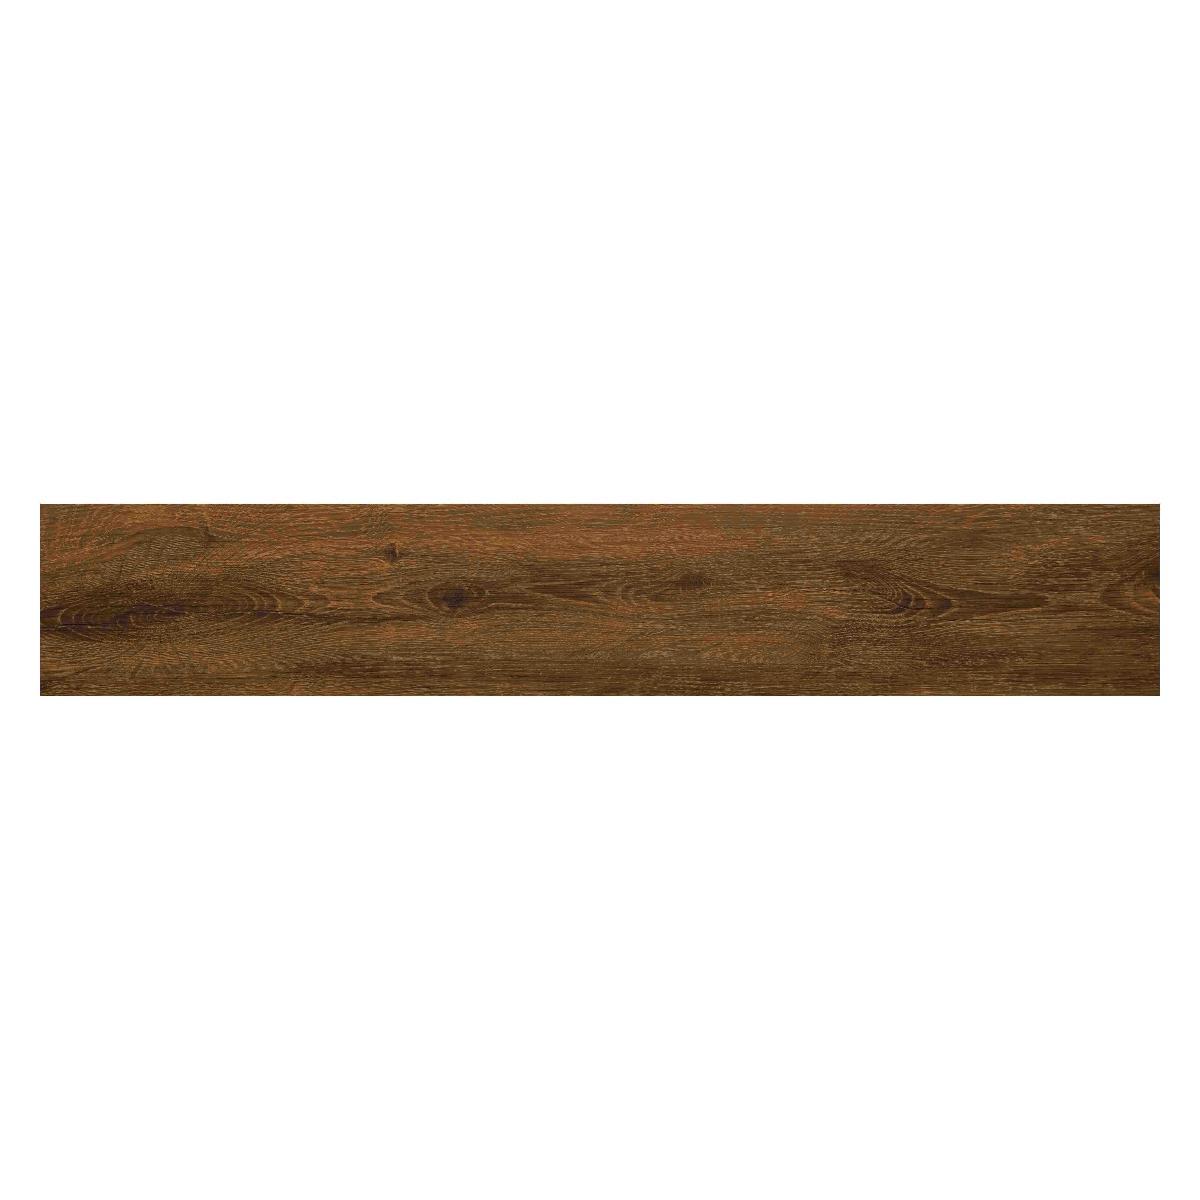 Piso PVC Manhattan Roble Nagana Mate - 18.4X12.2 - 2.24 m2